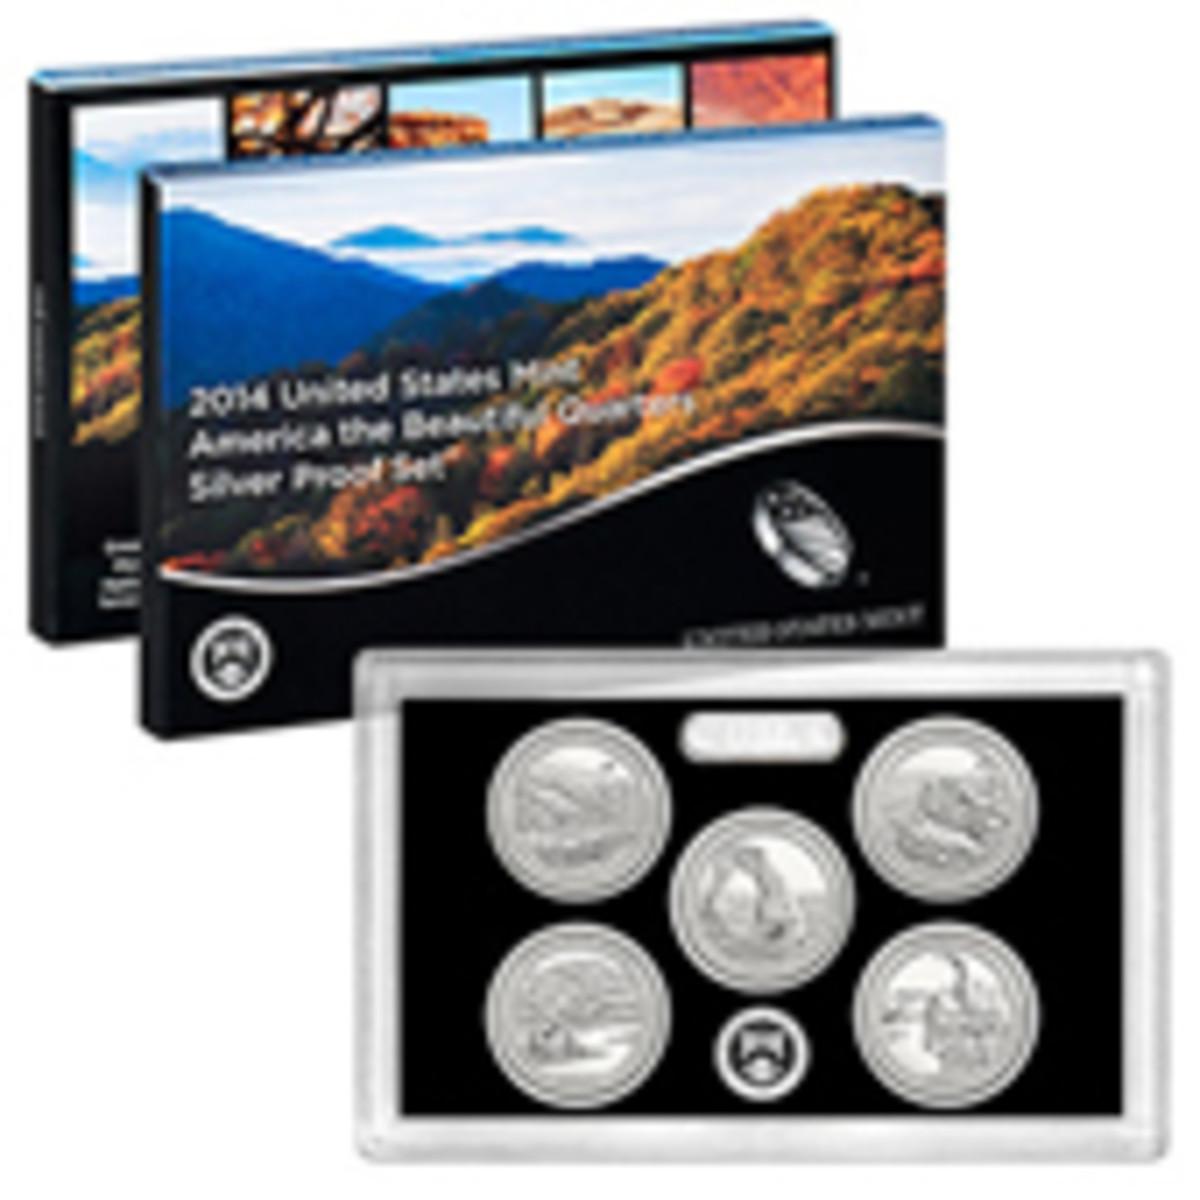 2014 Silver Quarter Proof Set